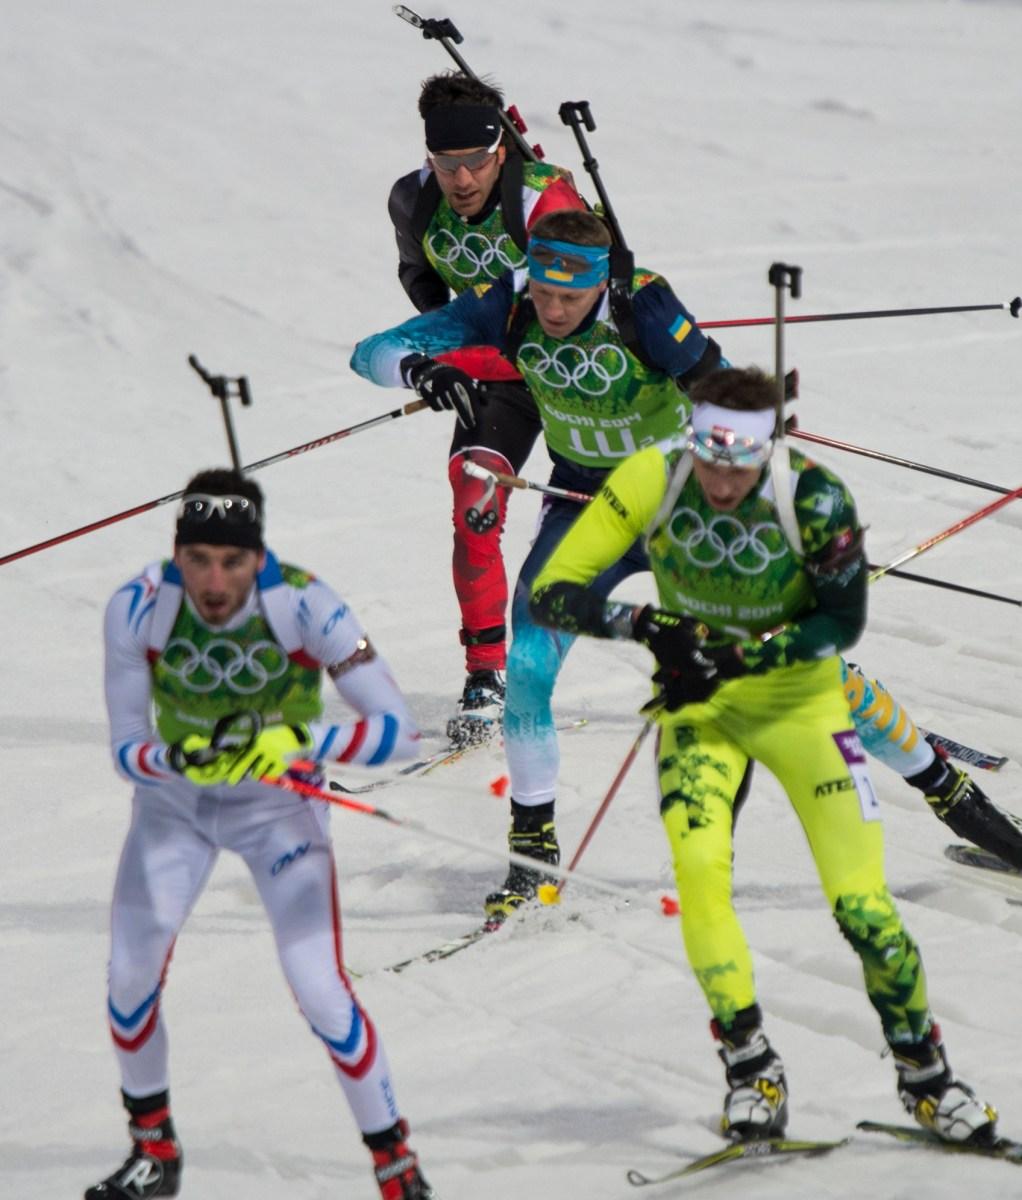 Athletes skiing